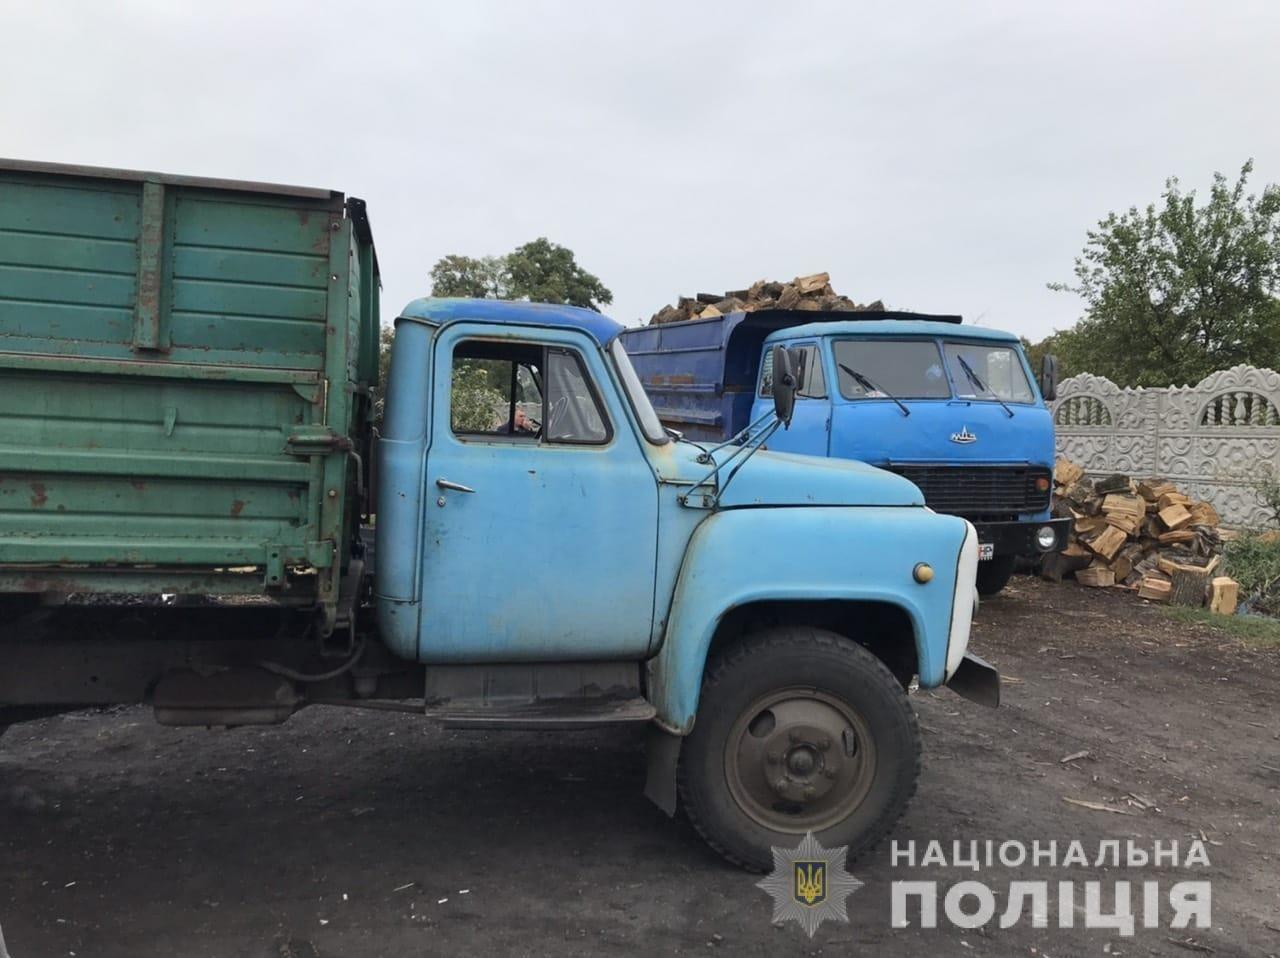 На Днепропетровщине полиция обнаружила очередного дроворуба, - ФОТО, фото-2